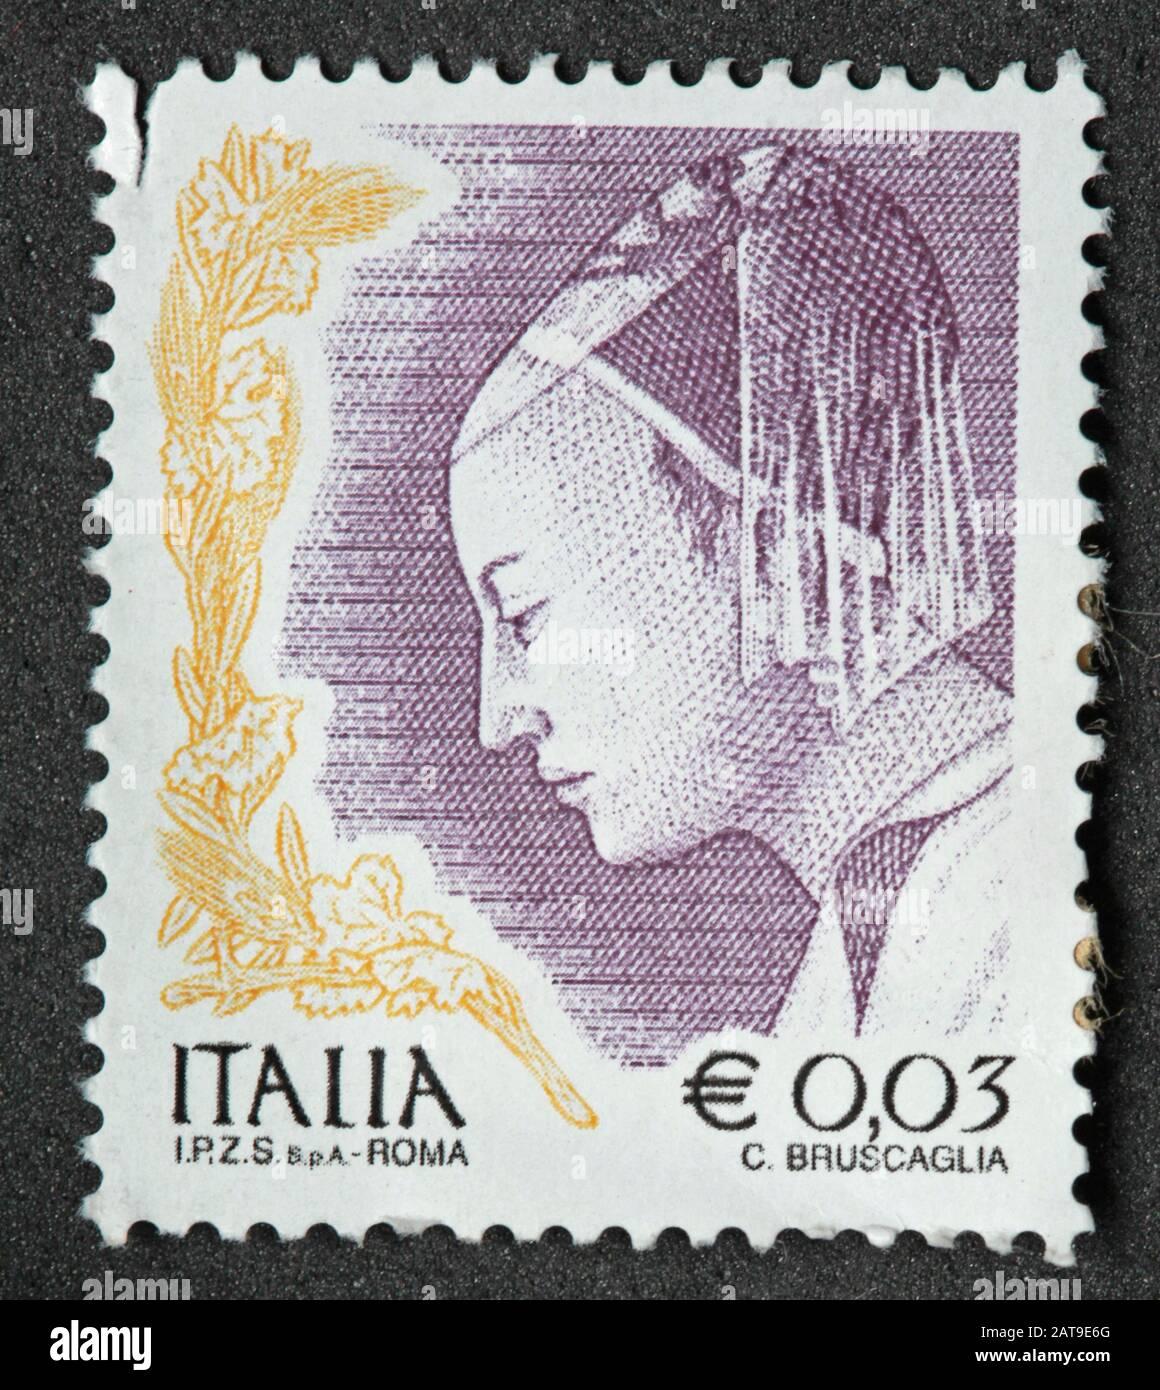 Hotpixuk,@Hotpixuk,GoTonySmith,stamp,postal,franked,frank,used stamps,used franked,used,franked stamp,from envelope,history,historic,old,Italy,Italian,Italia,Italy Stamp,italian stamp,franked Italian stamp,used Italian stamp,Italy stamp,hat,head covering,Italia Roma Stamp,Italia 0.03,3c,3cent,portrait,girl,woman,female